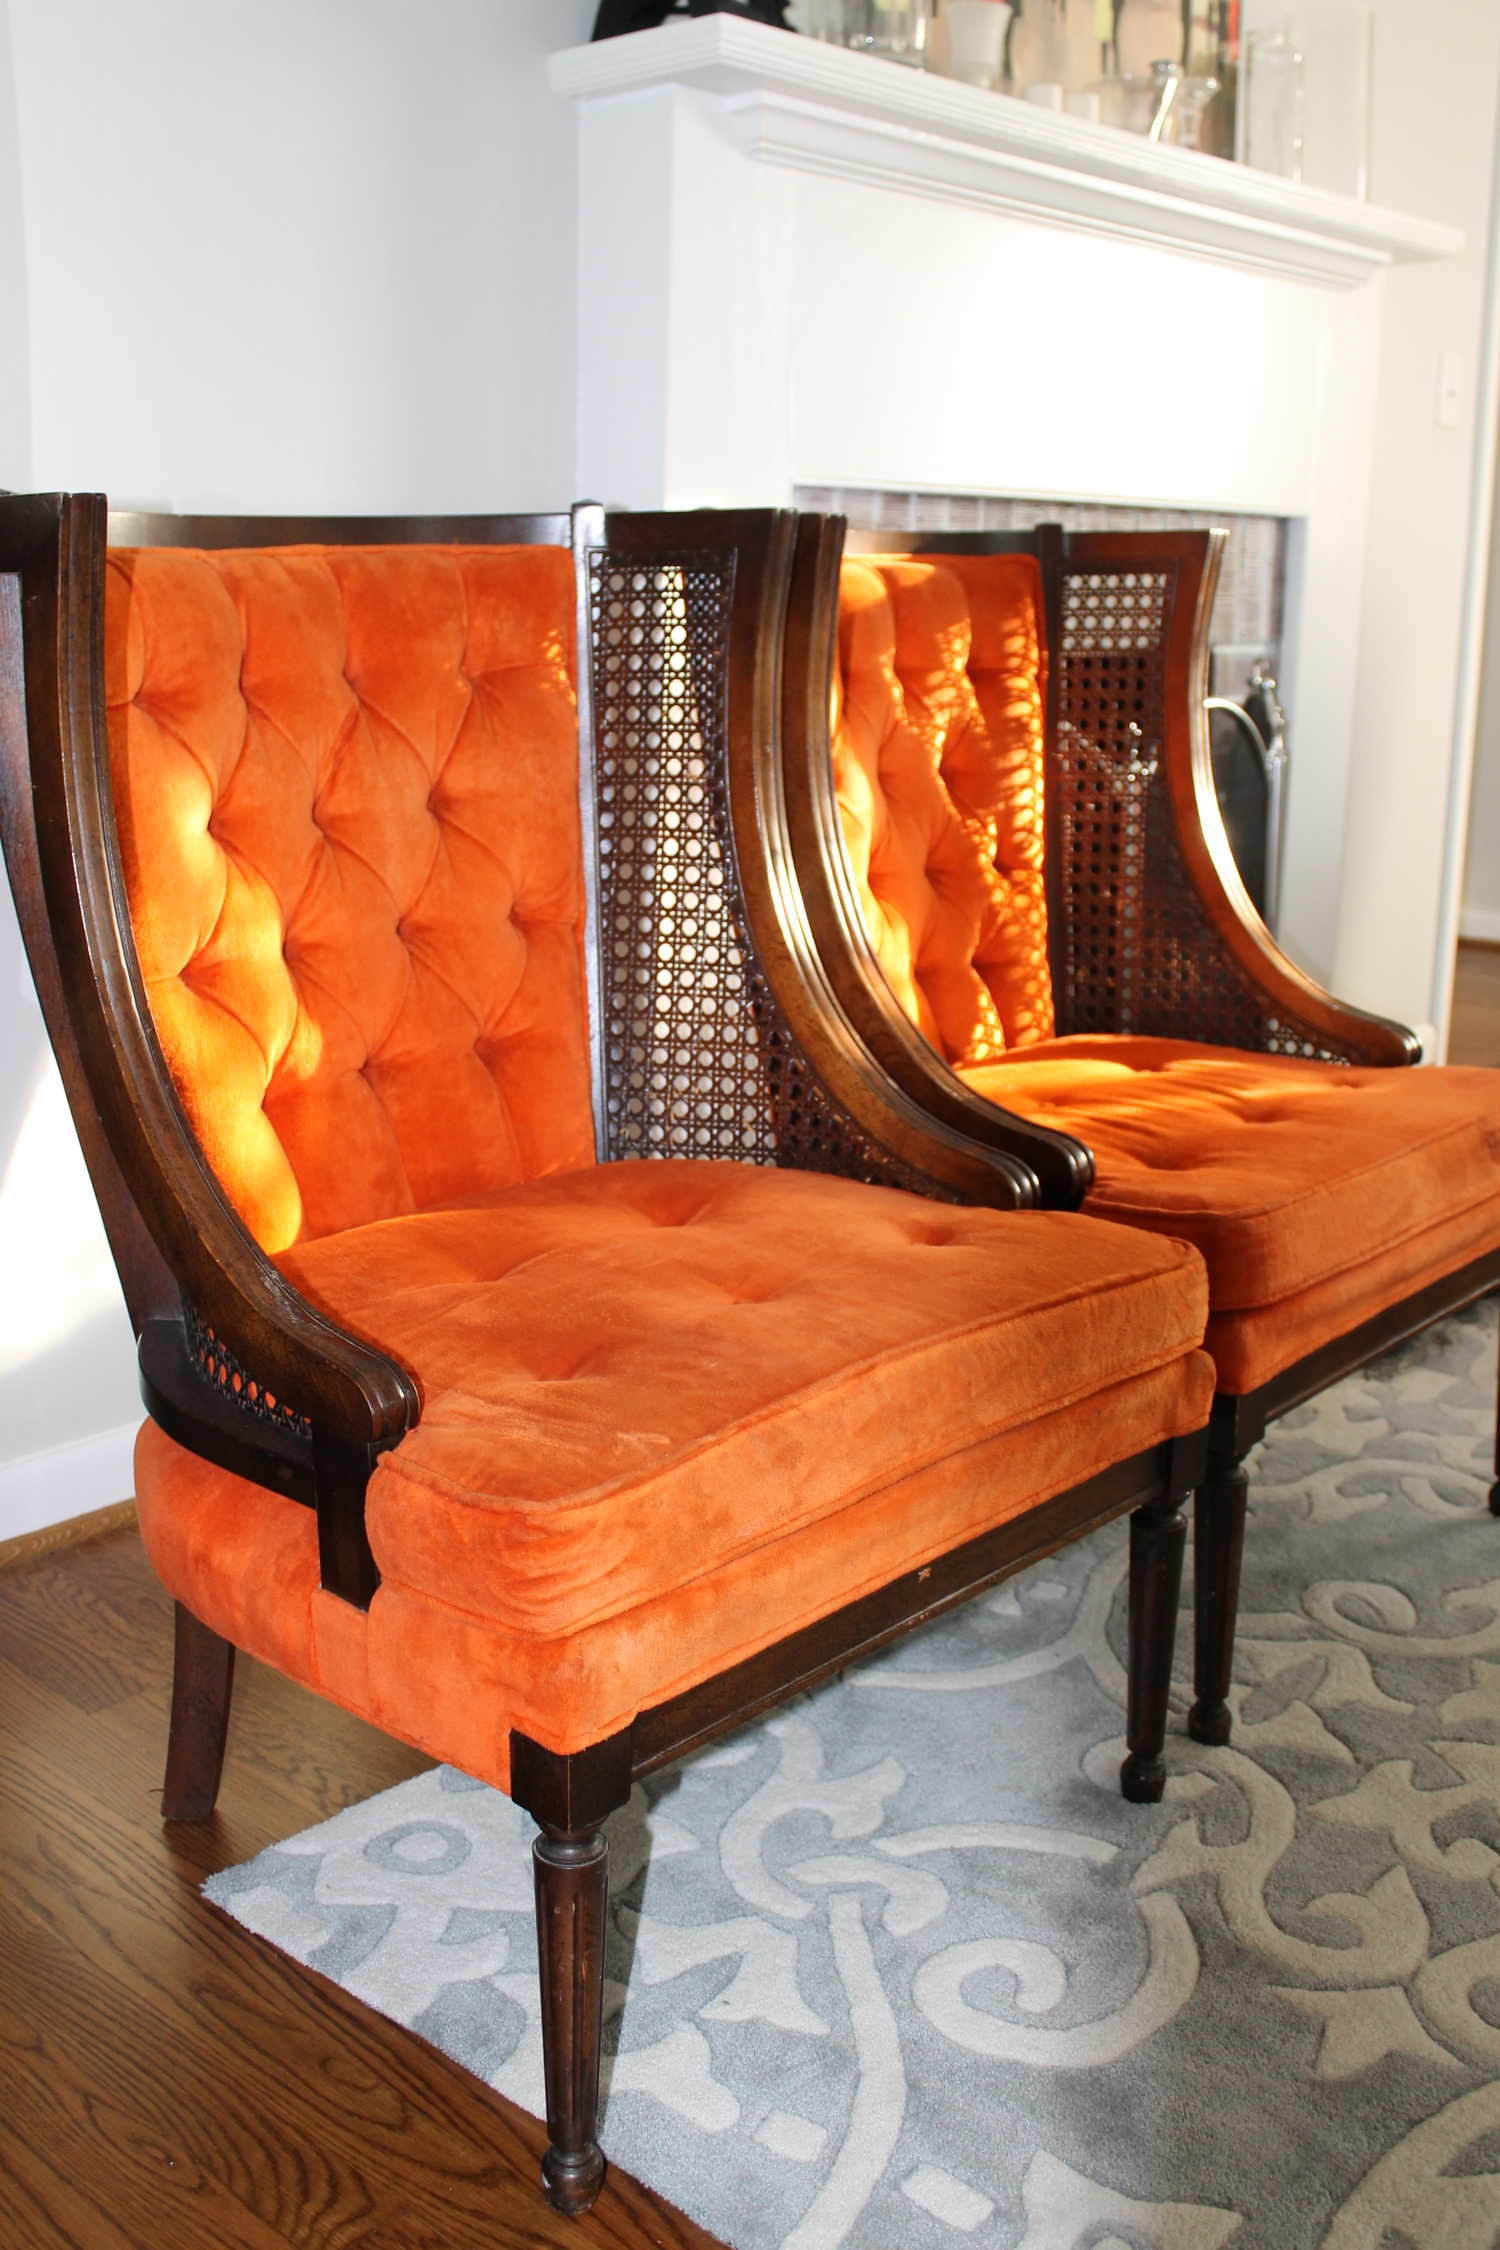 Tufted Orange Cane Wingback Chairs Vintage Furniture Elizabeth Burns Design Raleigh Nc Interior Designer